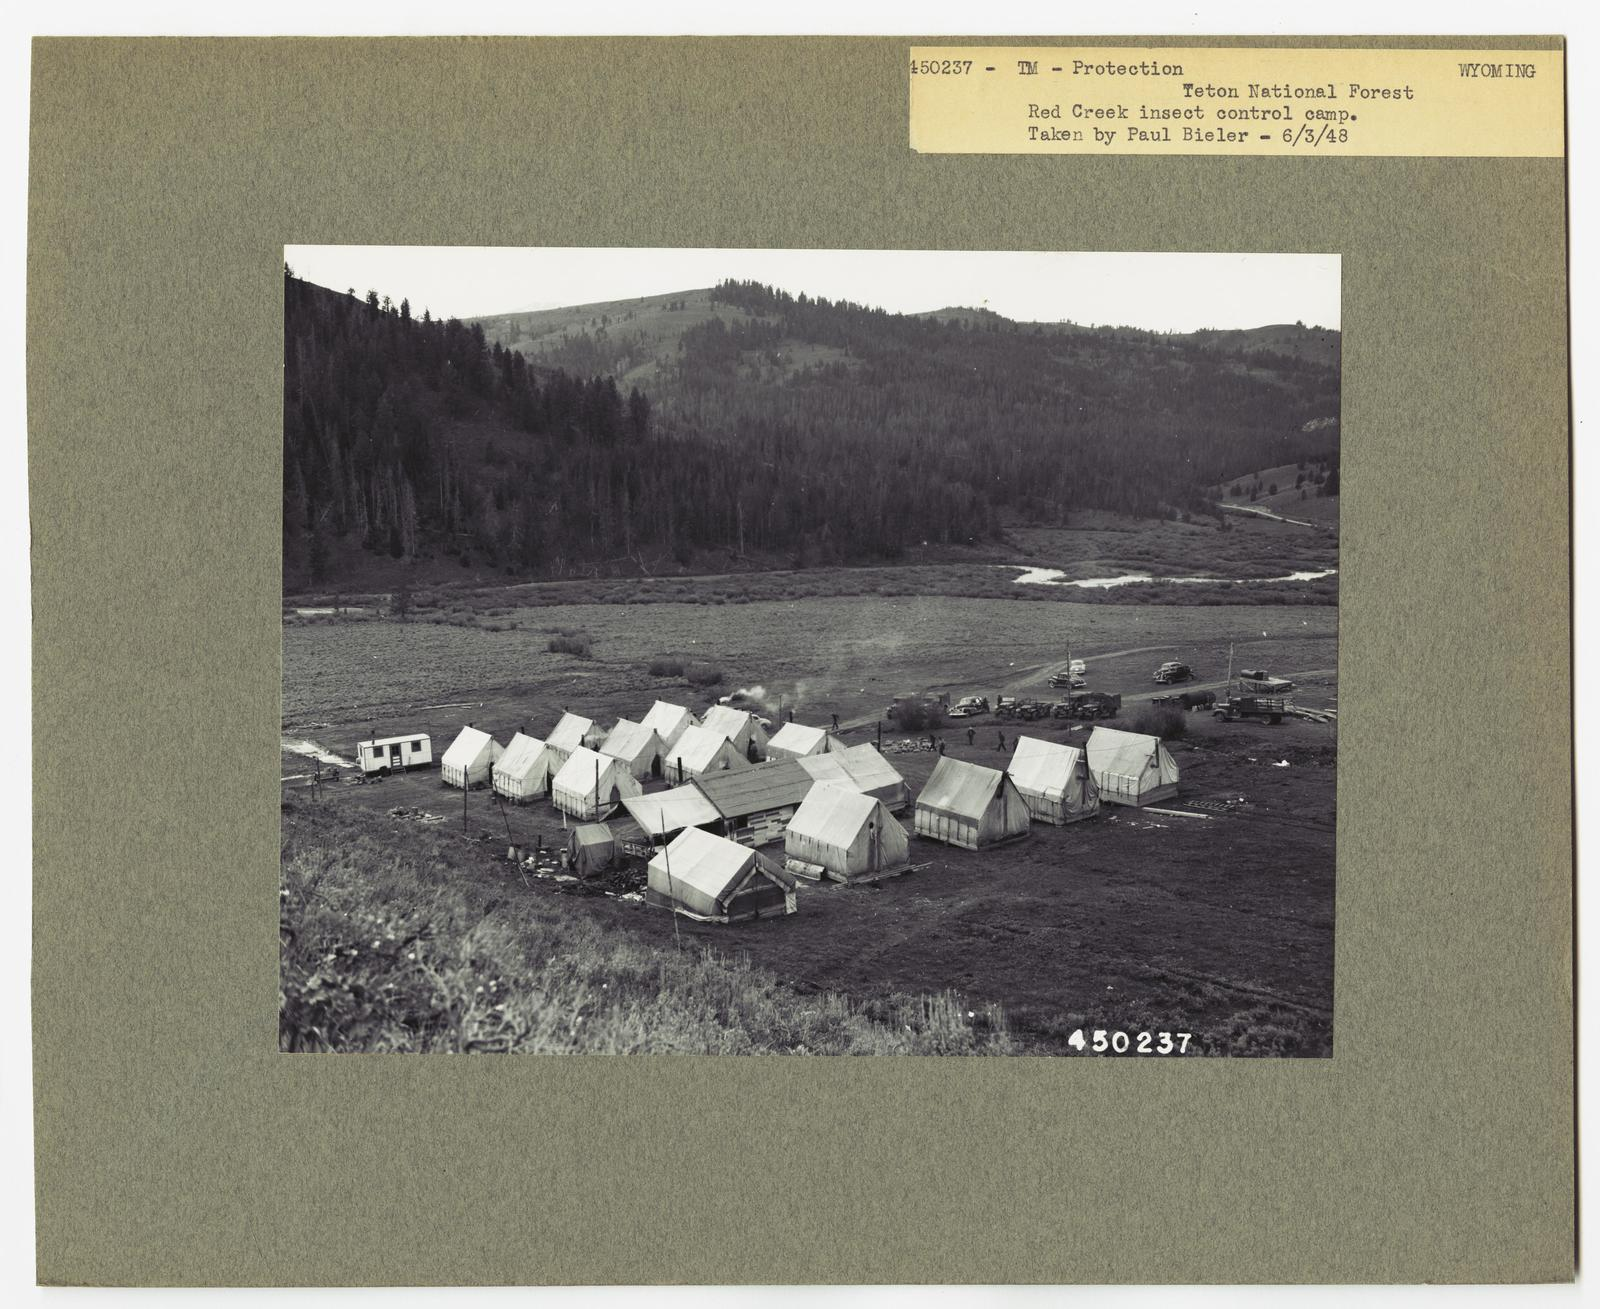 Disease Control - Wyoming